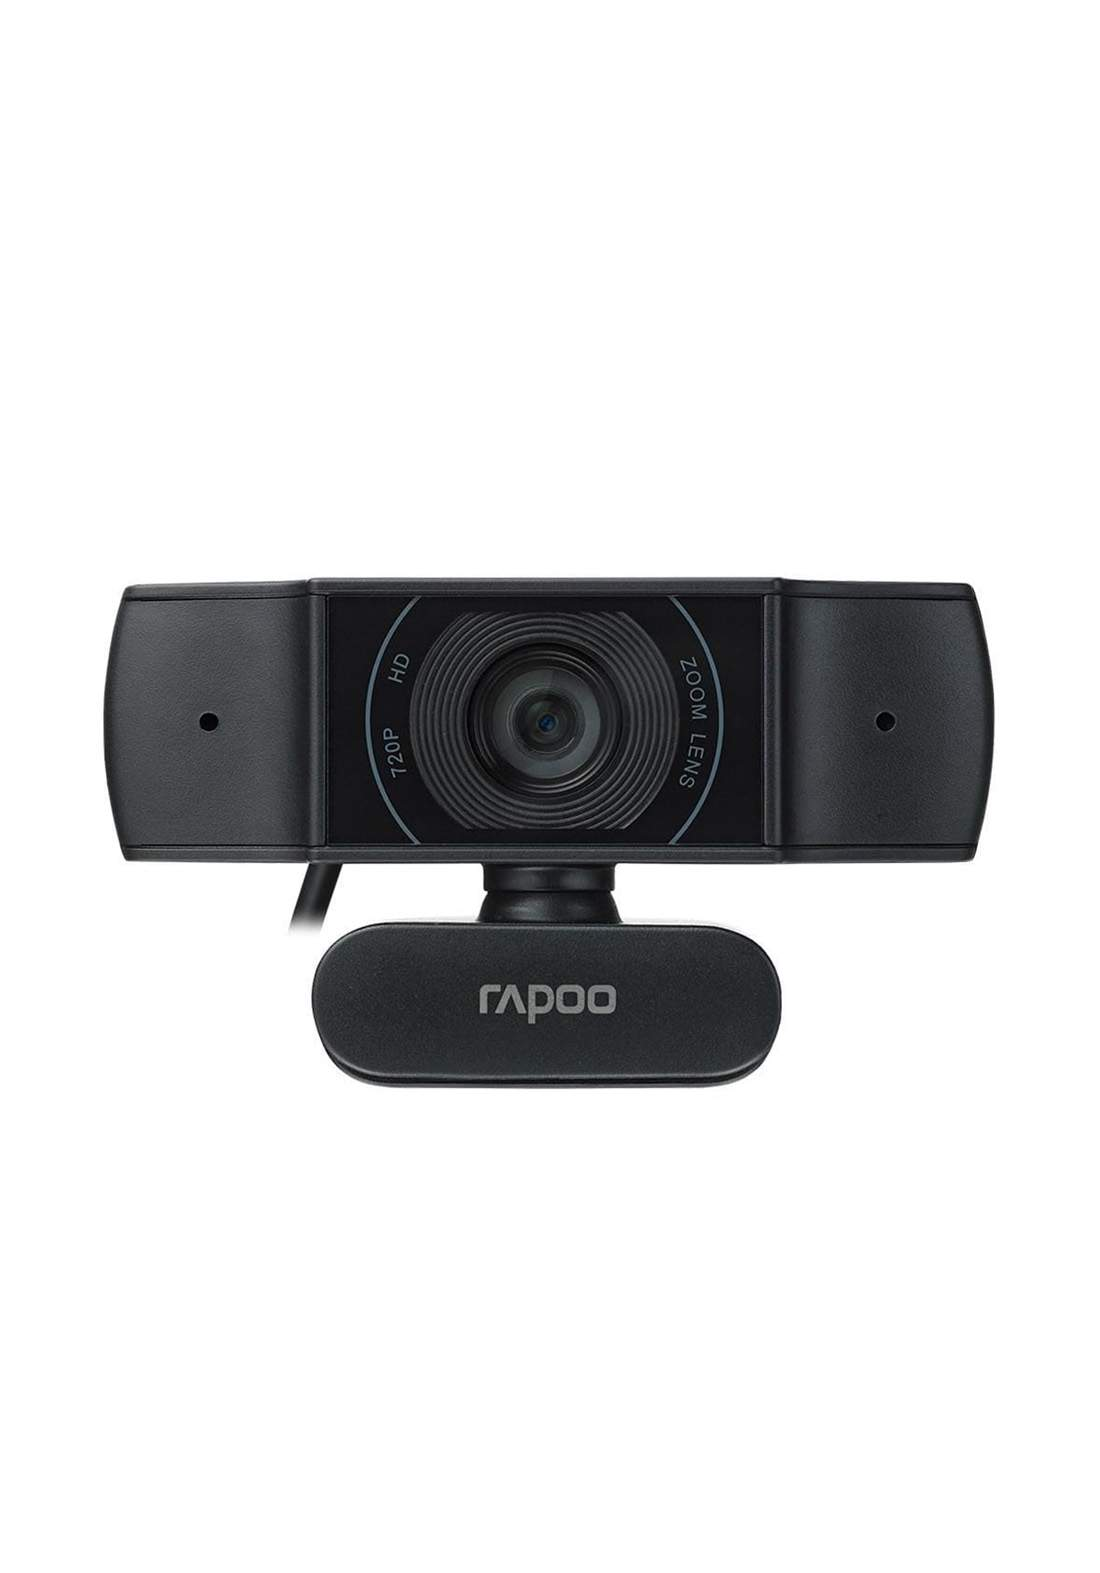 Rapoo C200 HD 720P Webcam - Black كاميرا